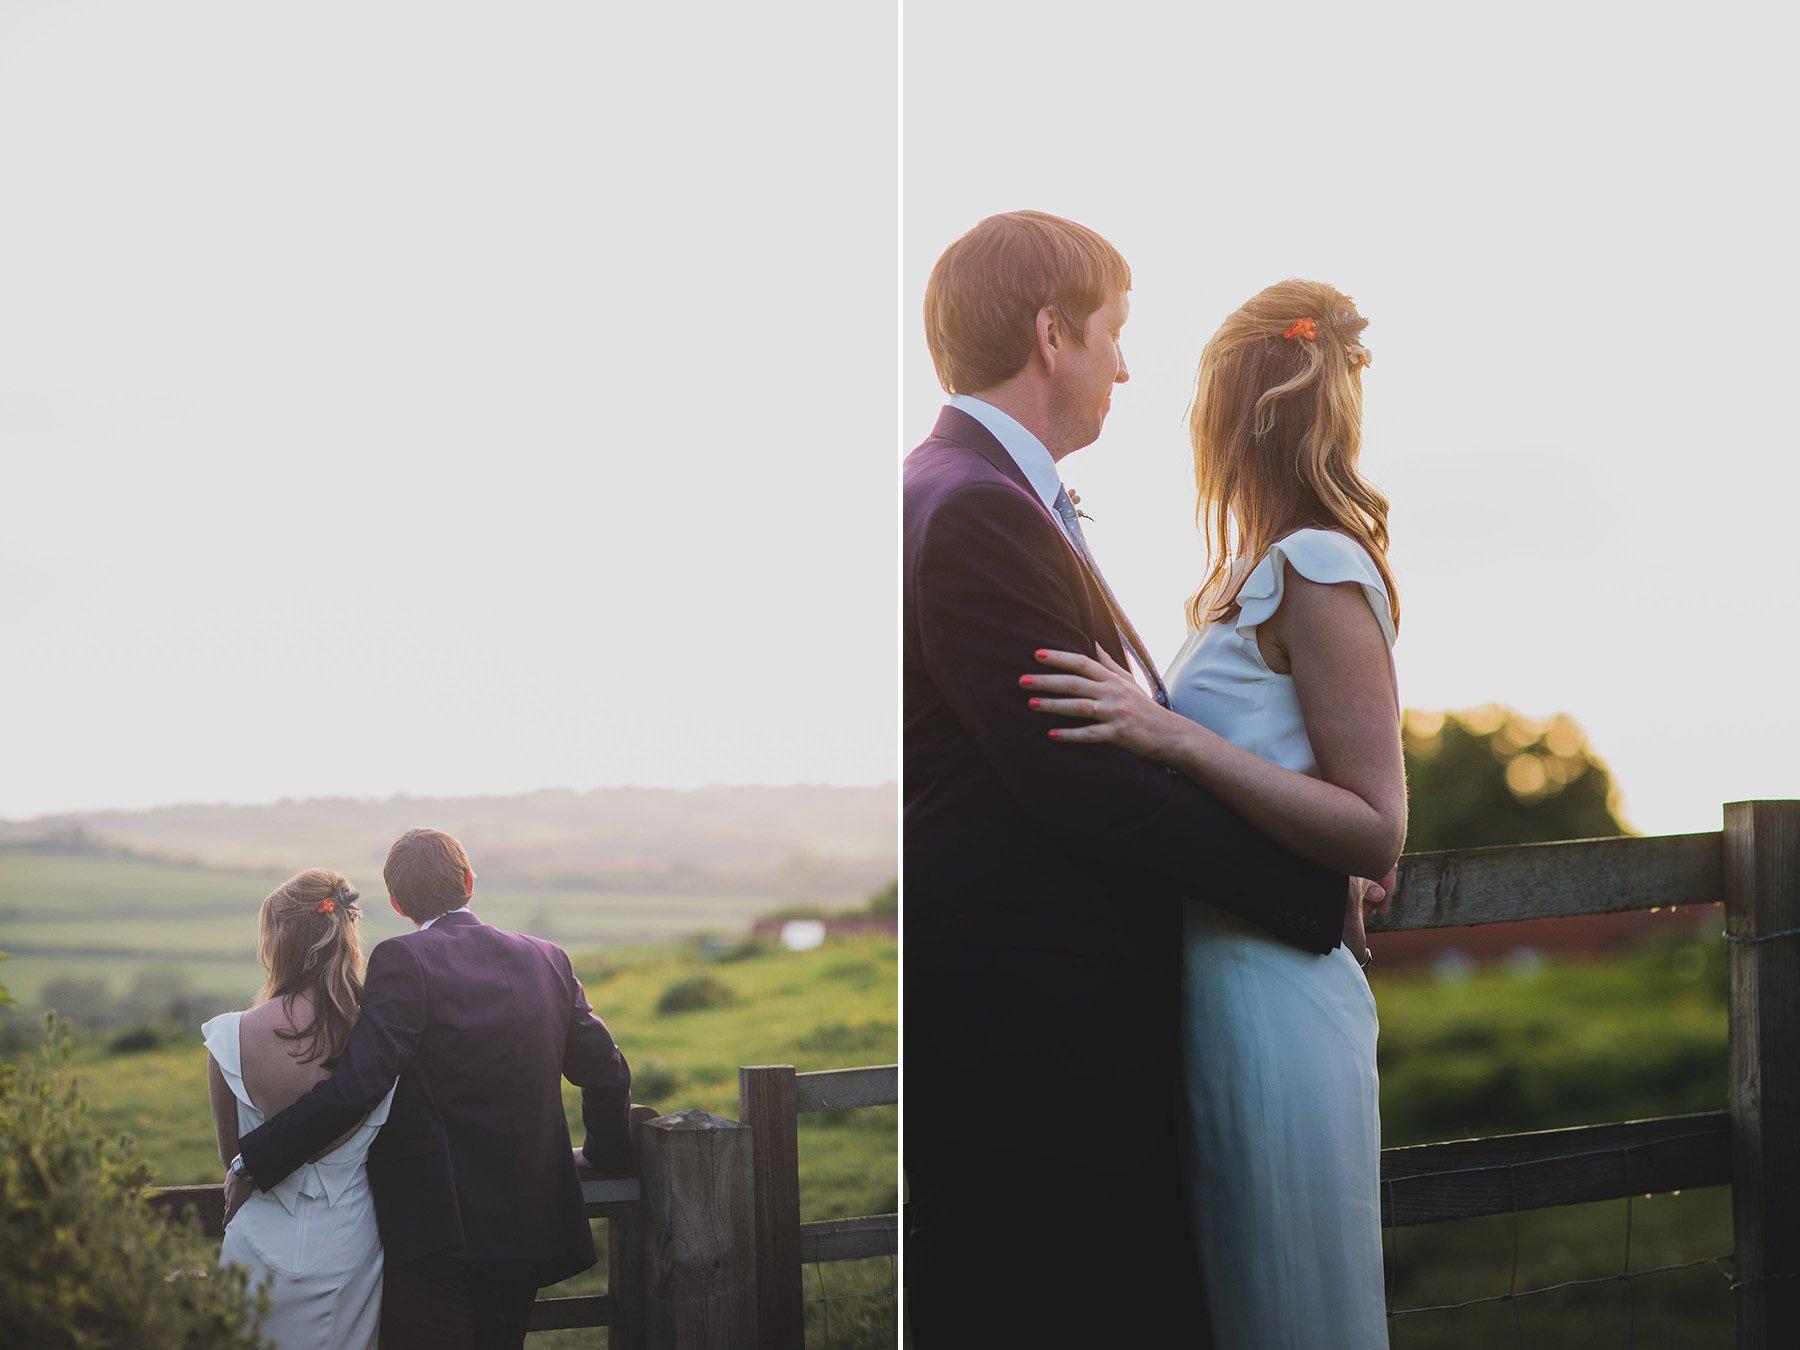 Buckinghamshire-Wedding-Lizzie-Duncan-123